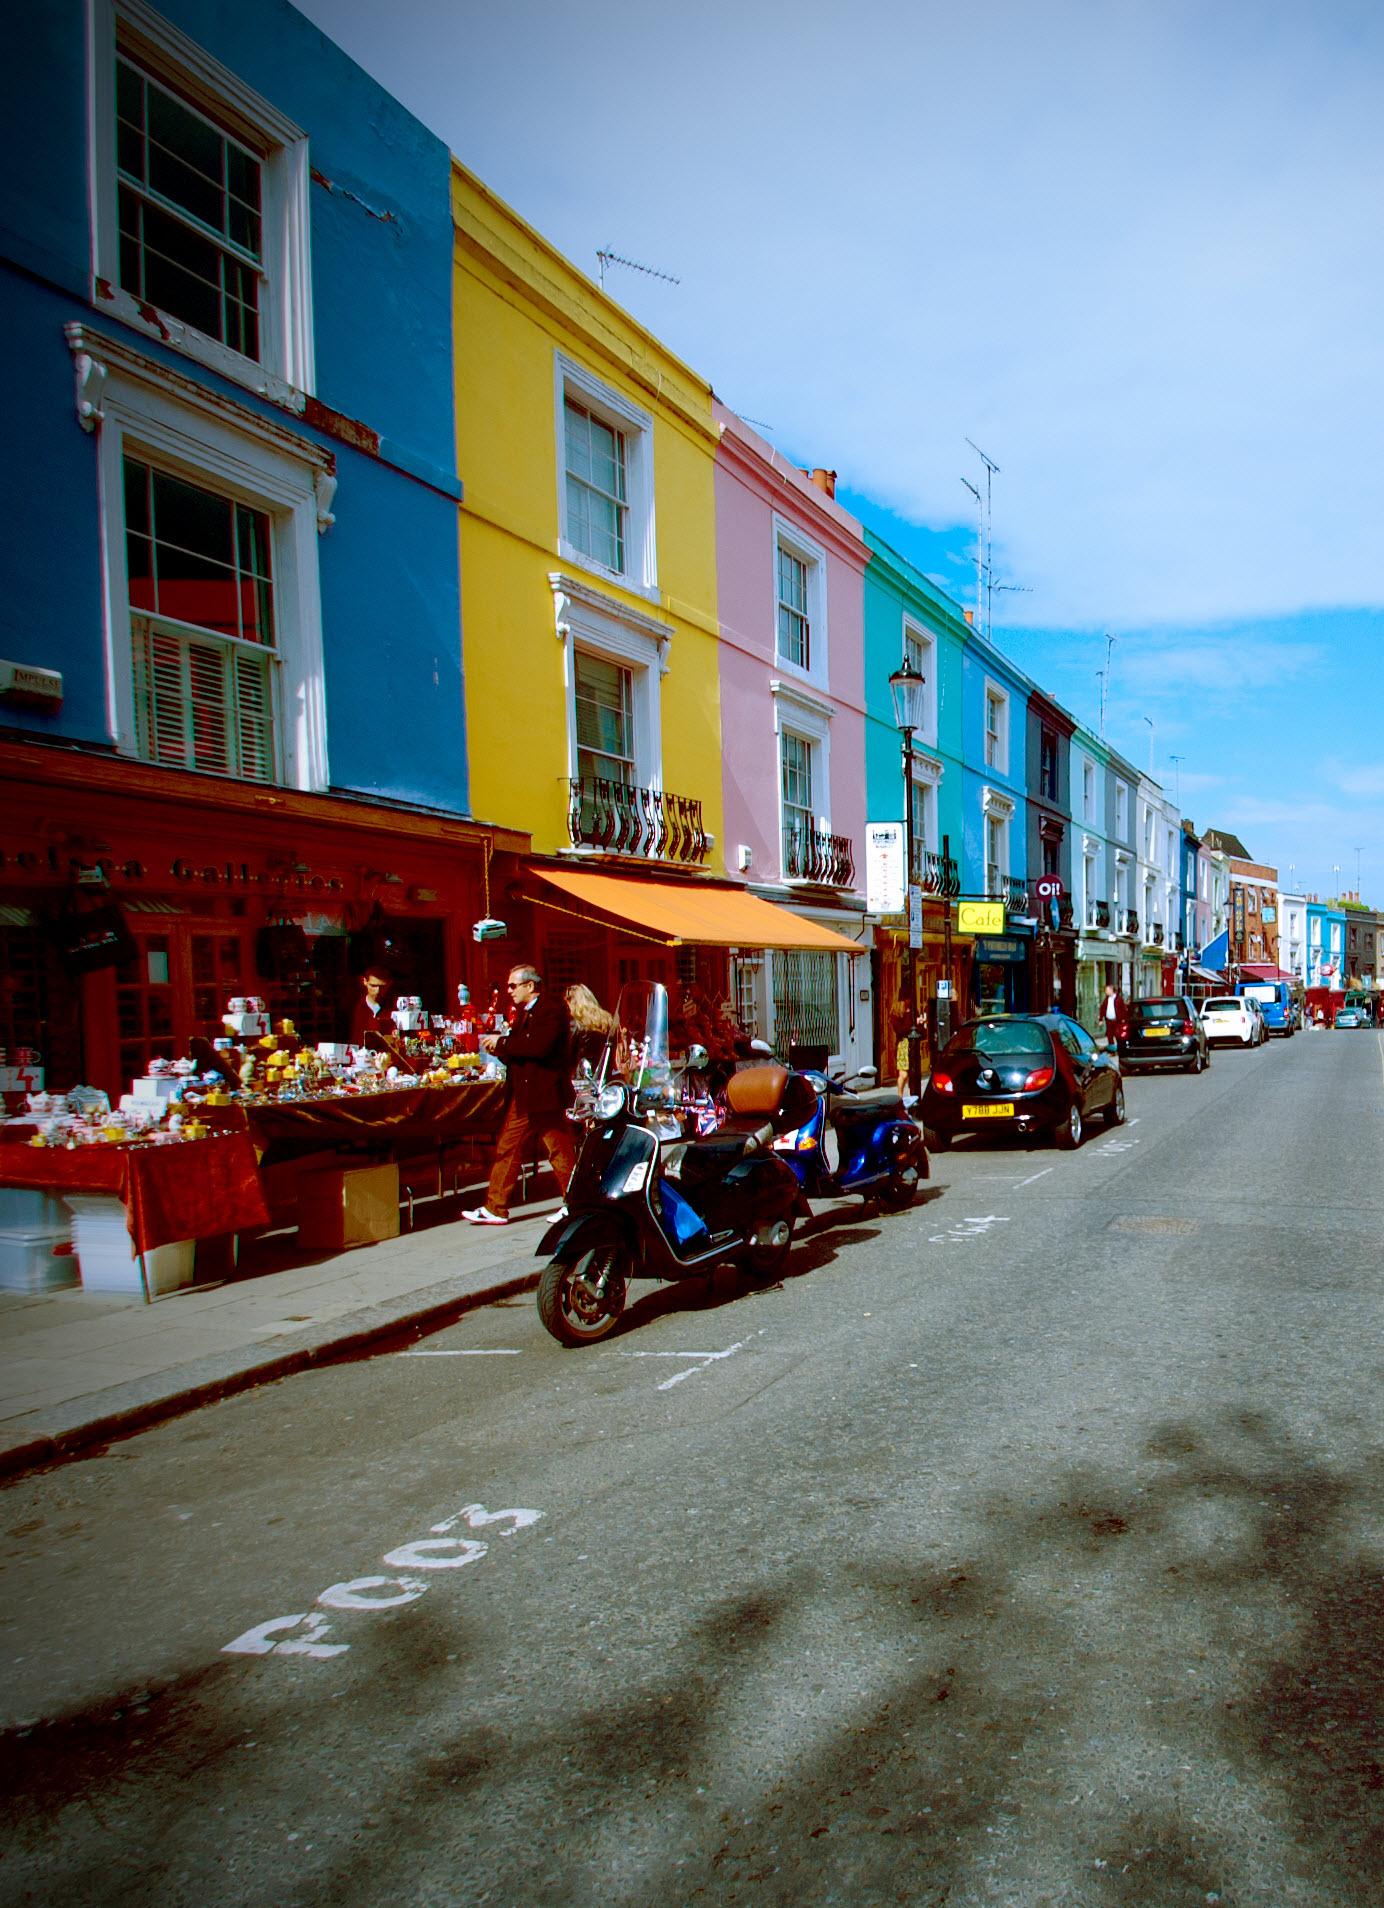 portobello road market i love marketsi love markets. Black Bedroom Furniture Sets. Home Design Ideas